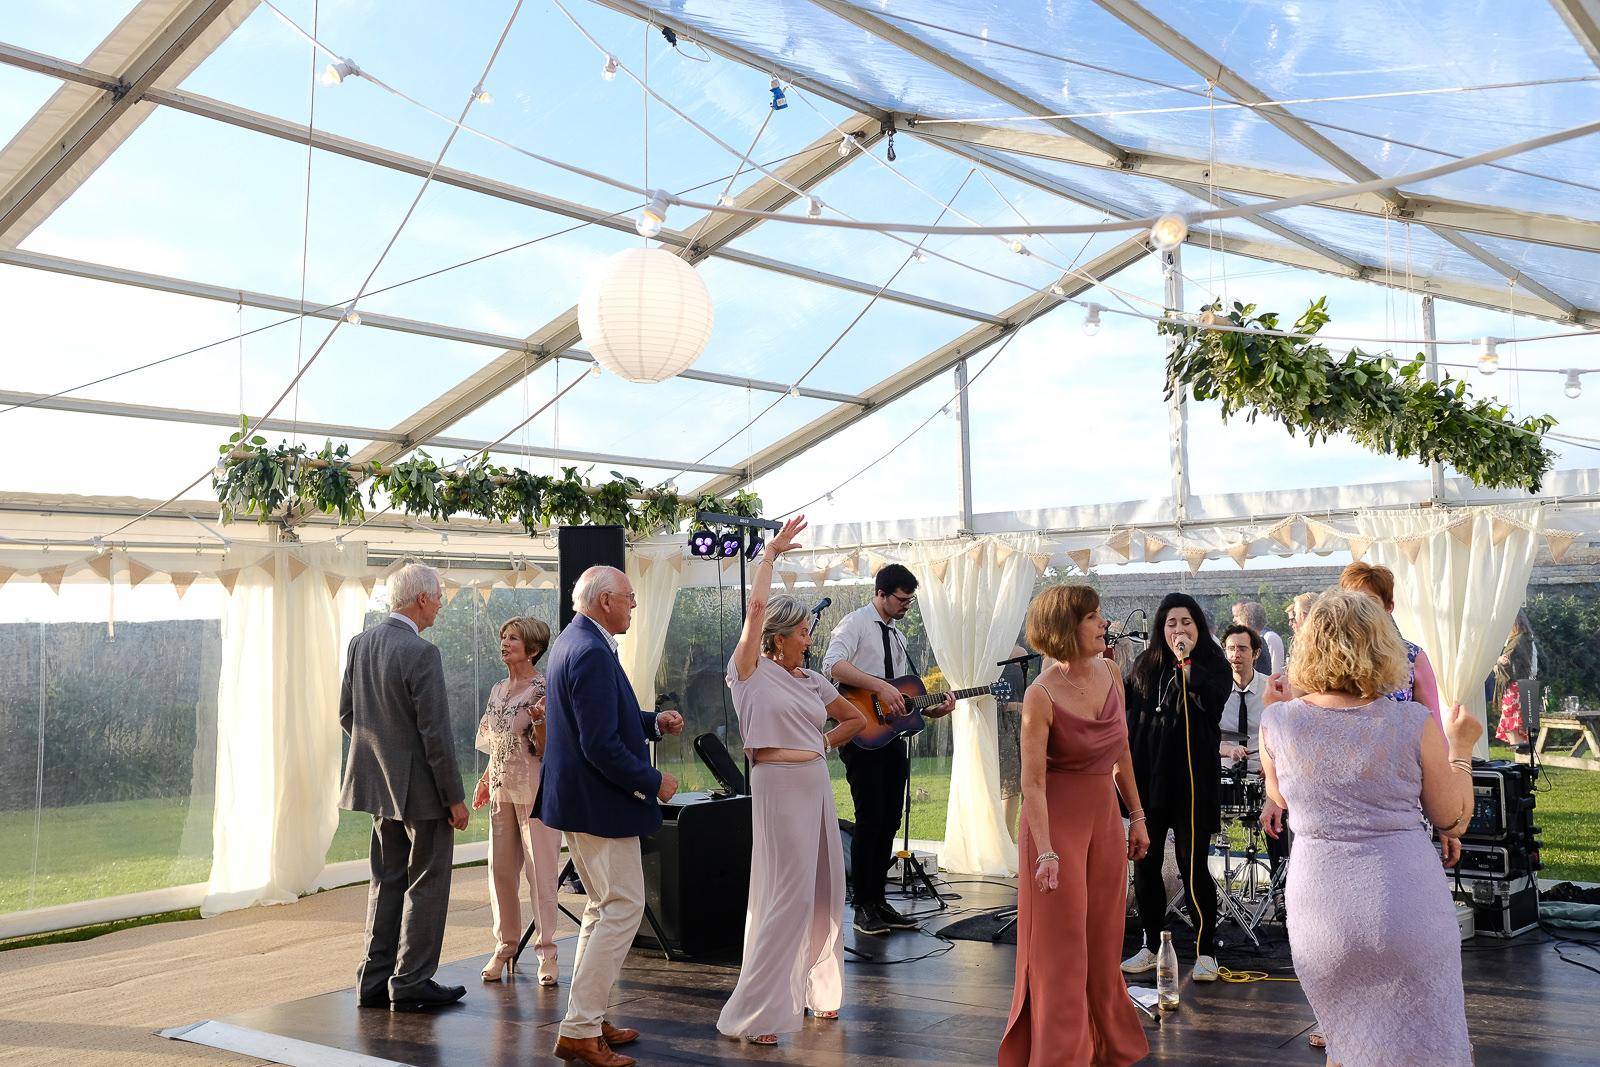 Roscarrock Farm wedding in Cornwall 076.jpg